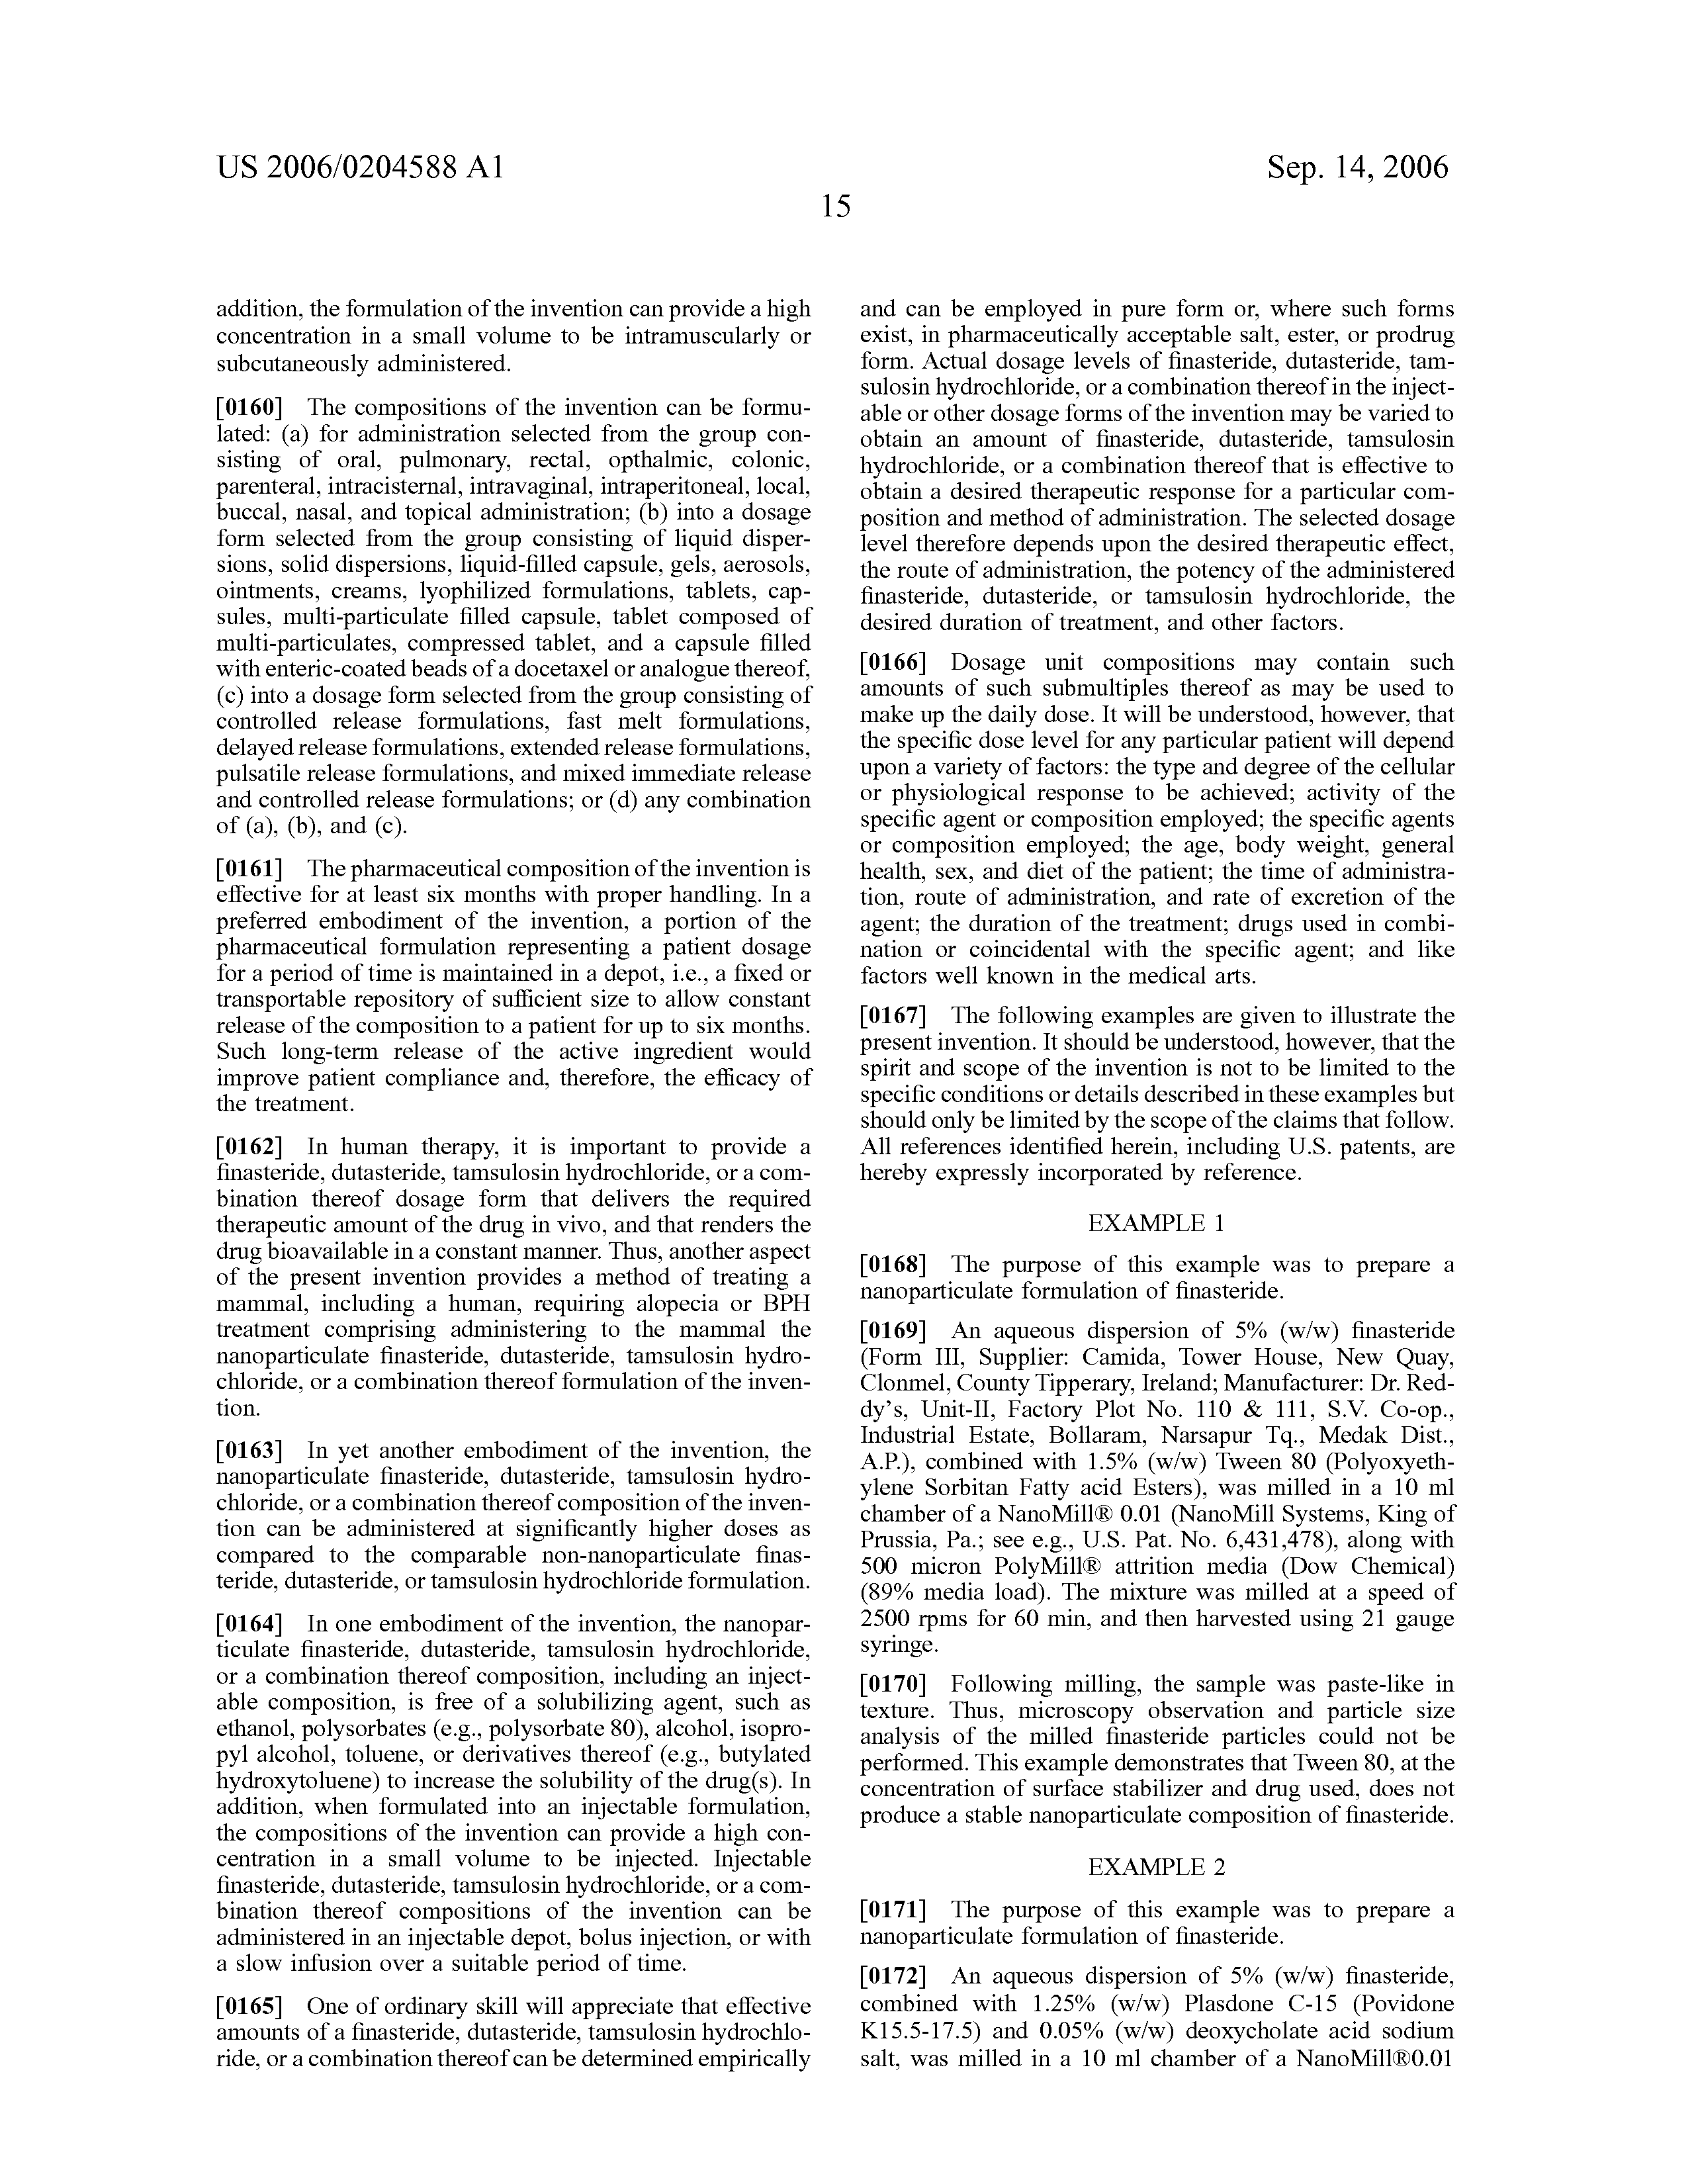 Propecia patent